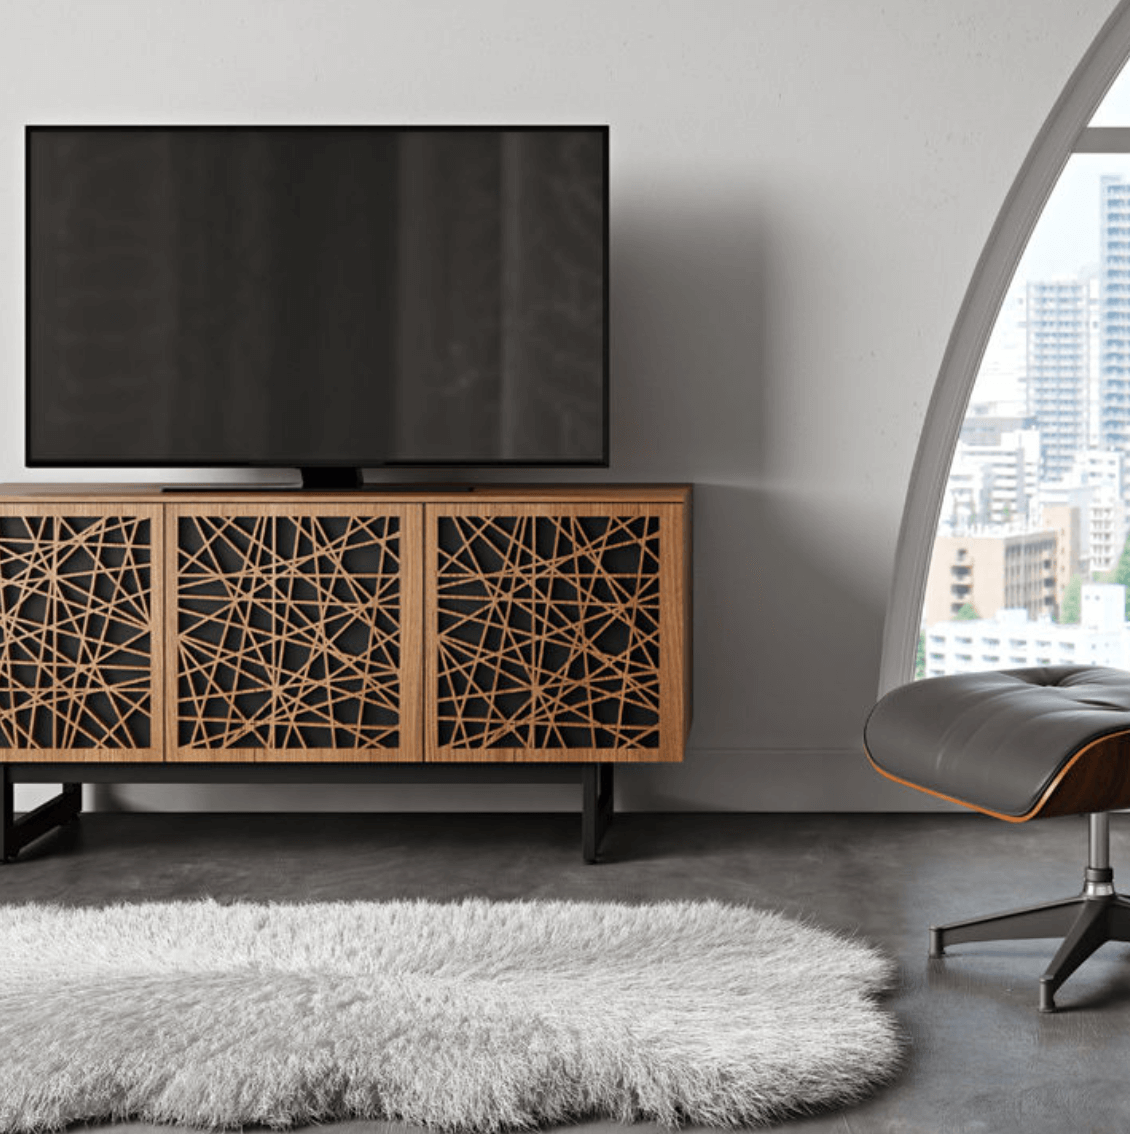 Brand Spotlight: Why We Love BDI • Practical Home Designs